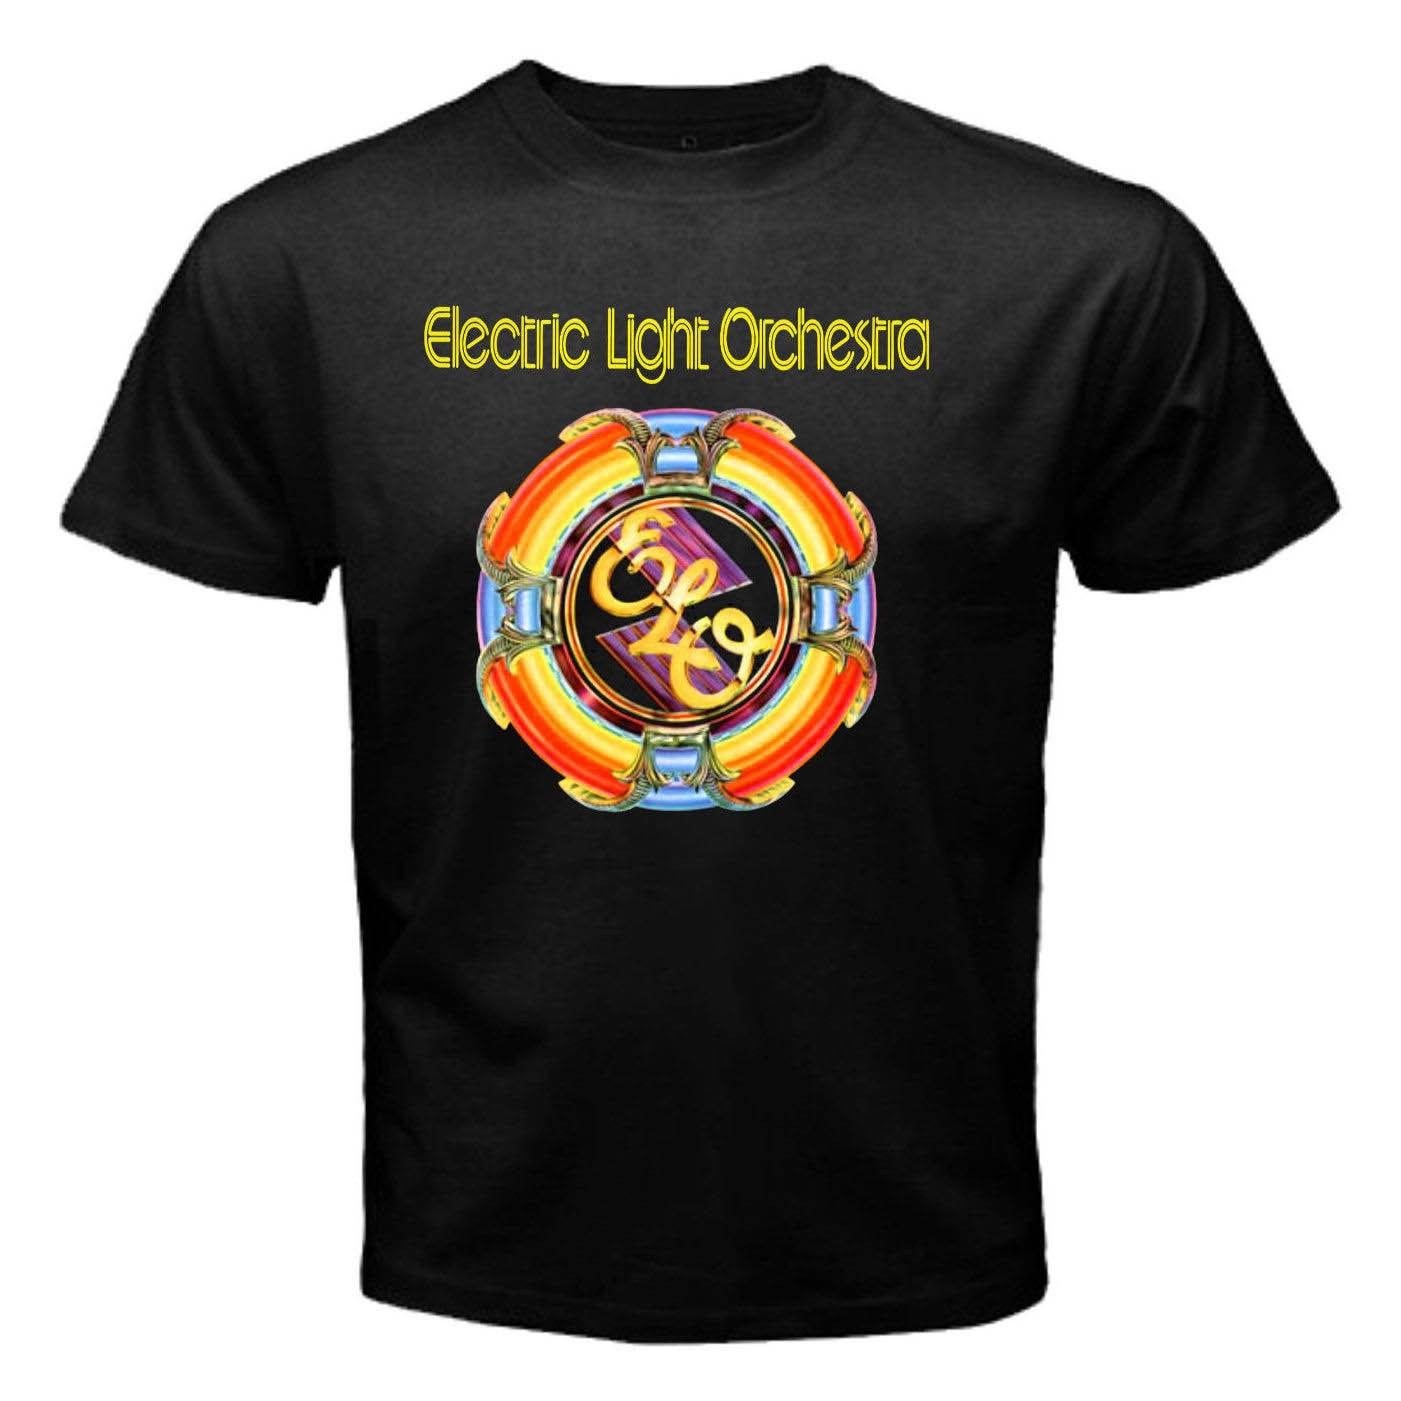 New ELECTRIC LIGHT ORCHESTRA Tshirt Rock Band ELO Logo Men's T-Shirt Print T-Shirt Mens Short